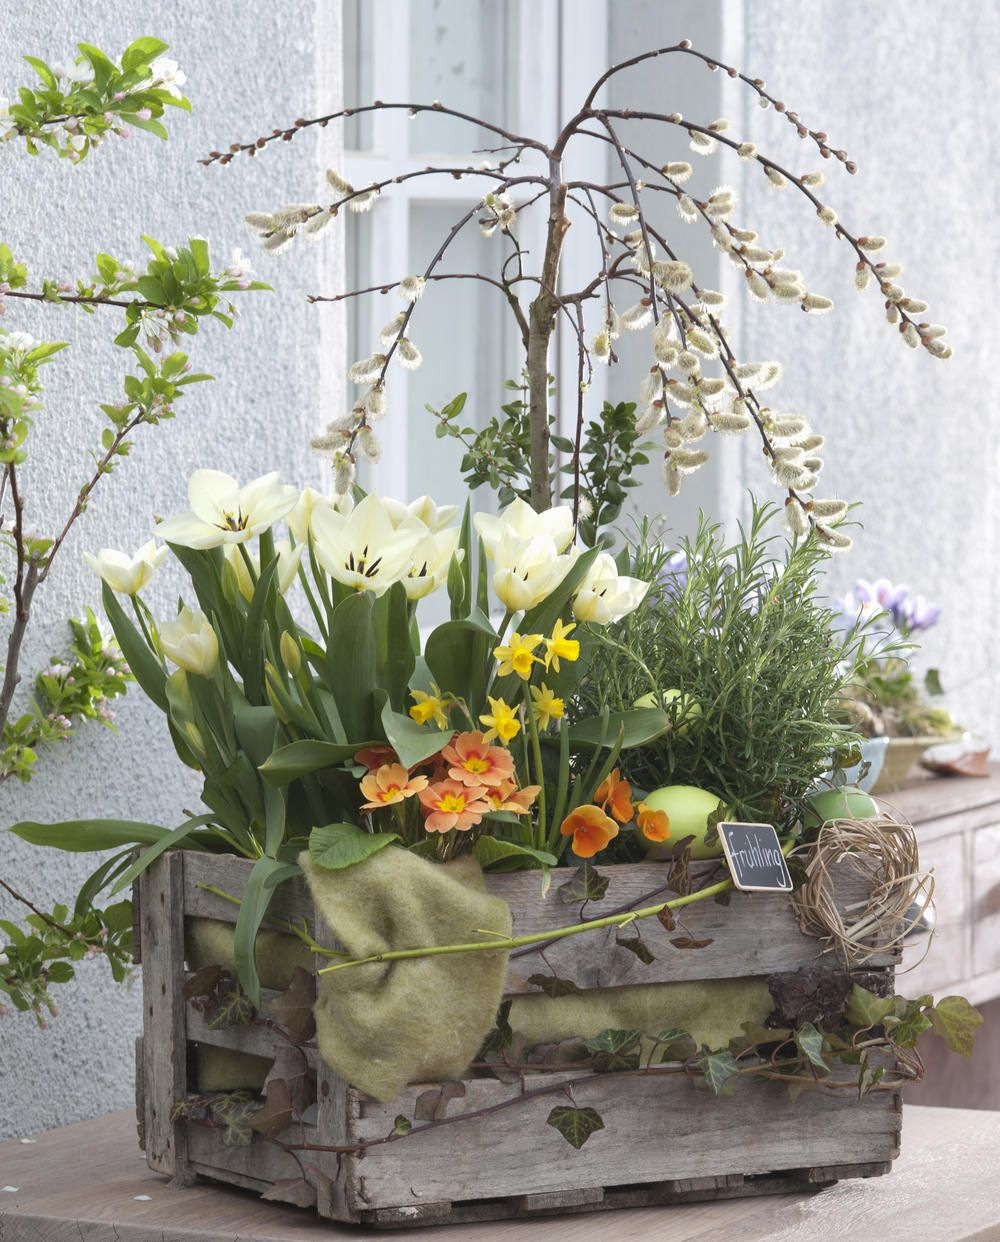 Deko-Ideen fürs Osterfest